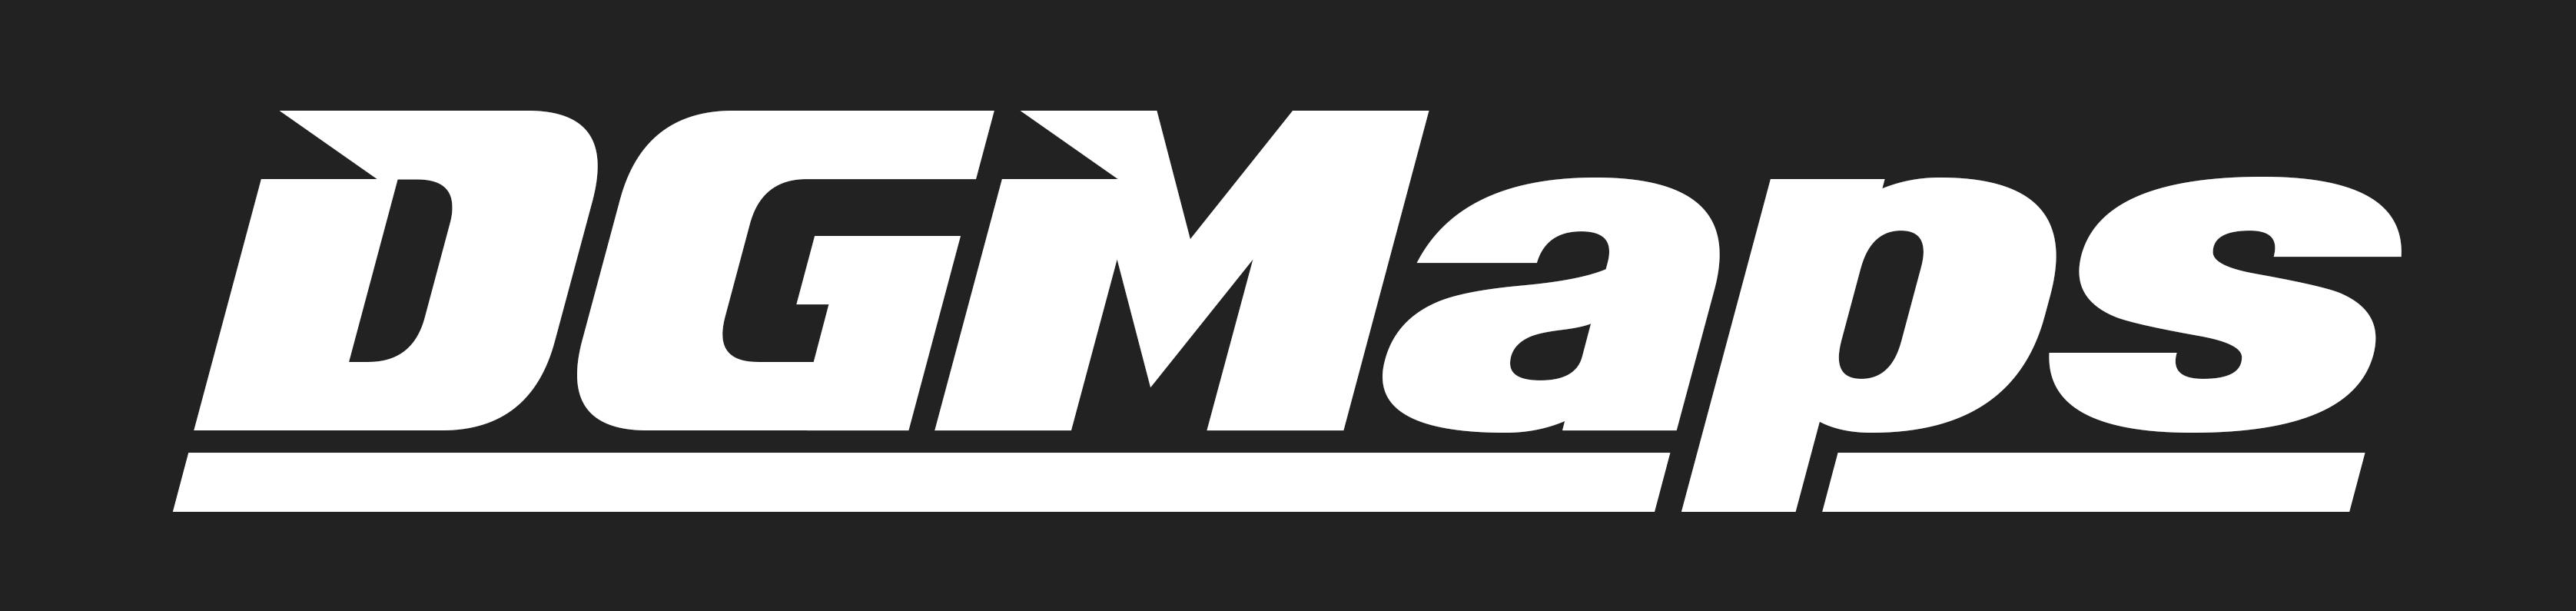 DGMaps logo